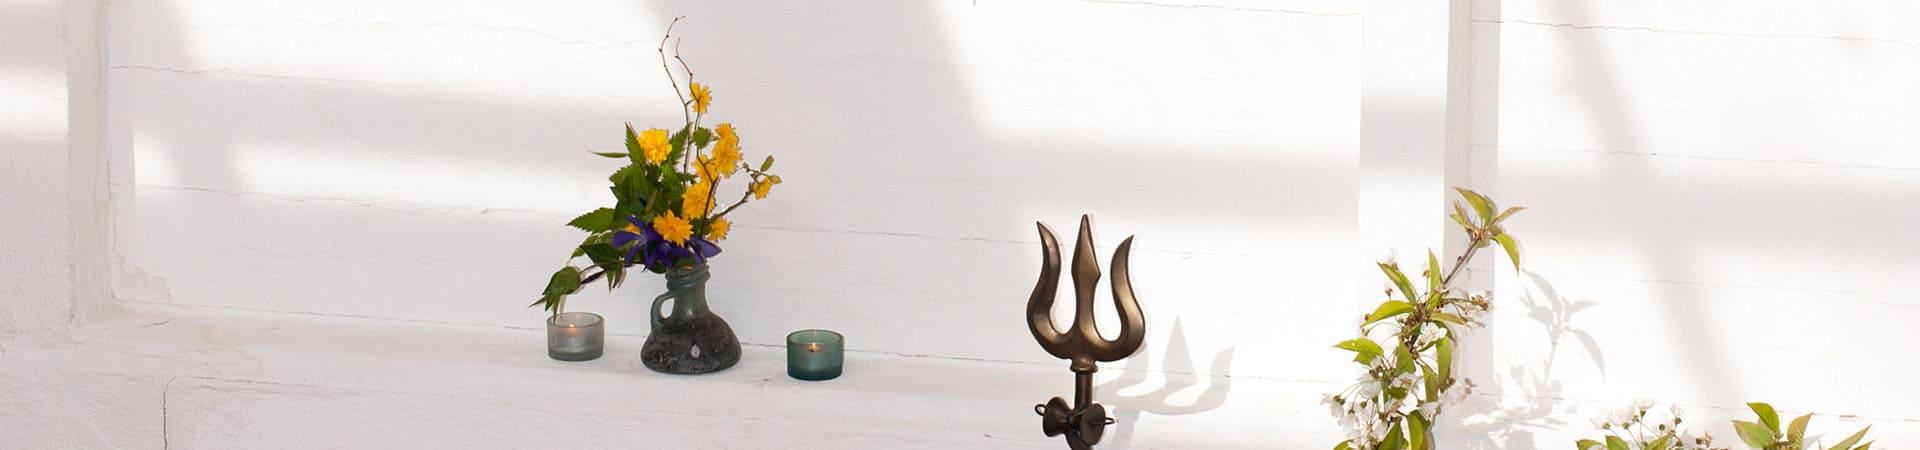 Meditations- und Seminarraum